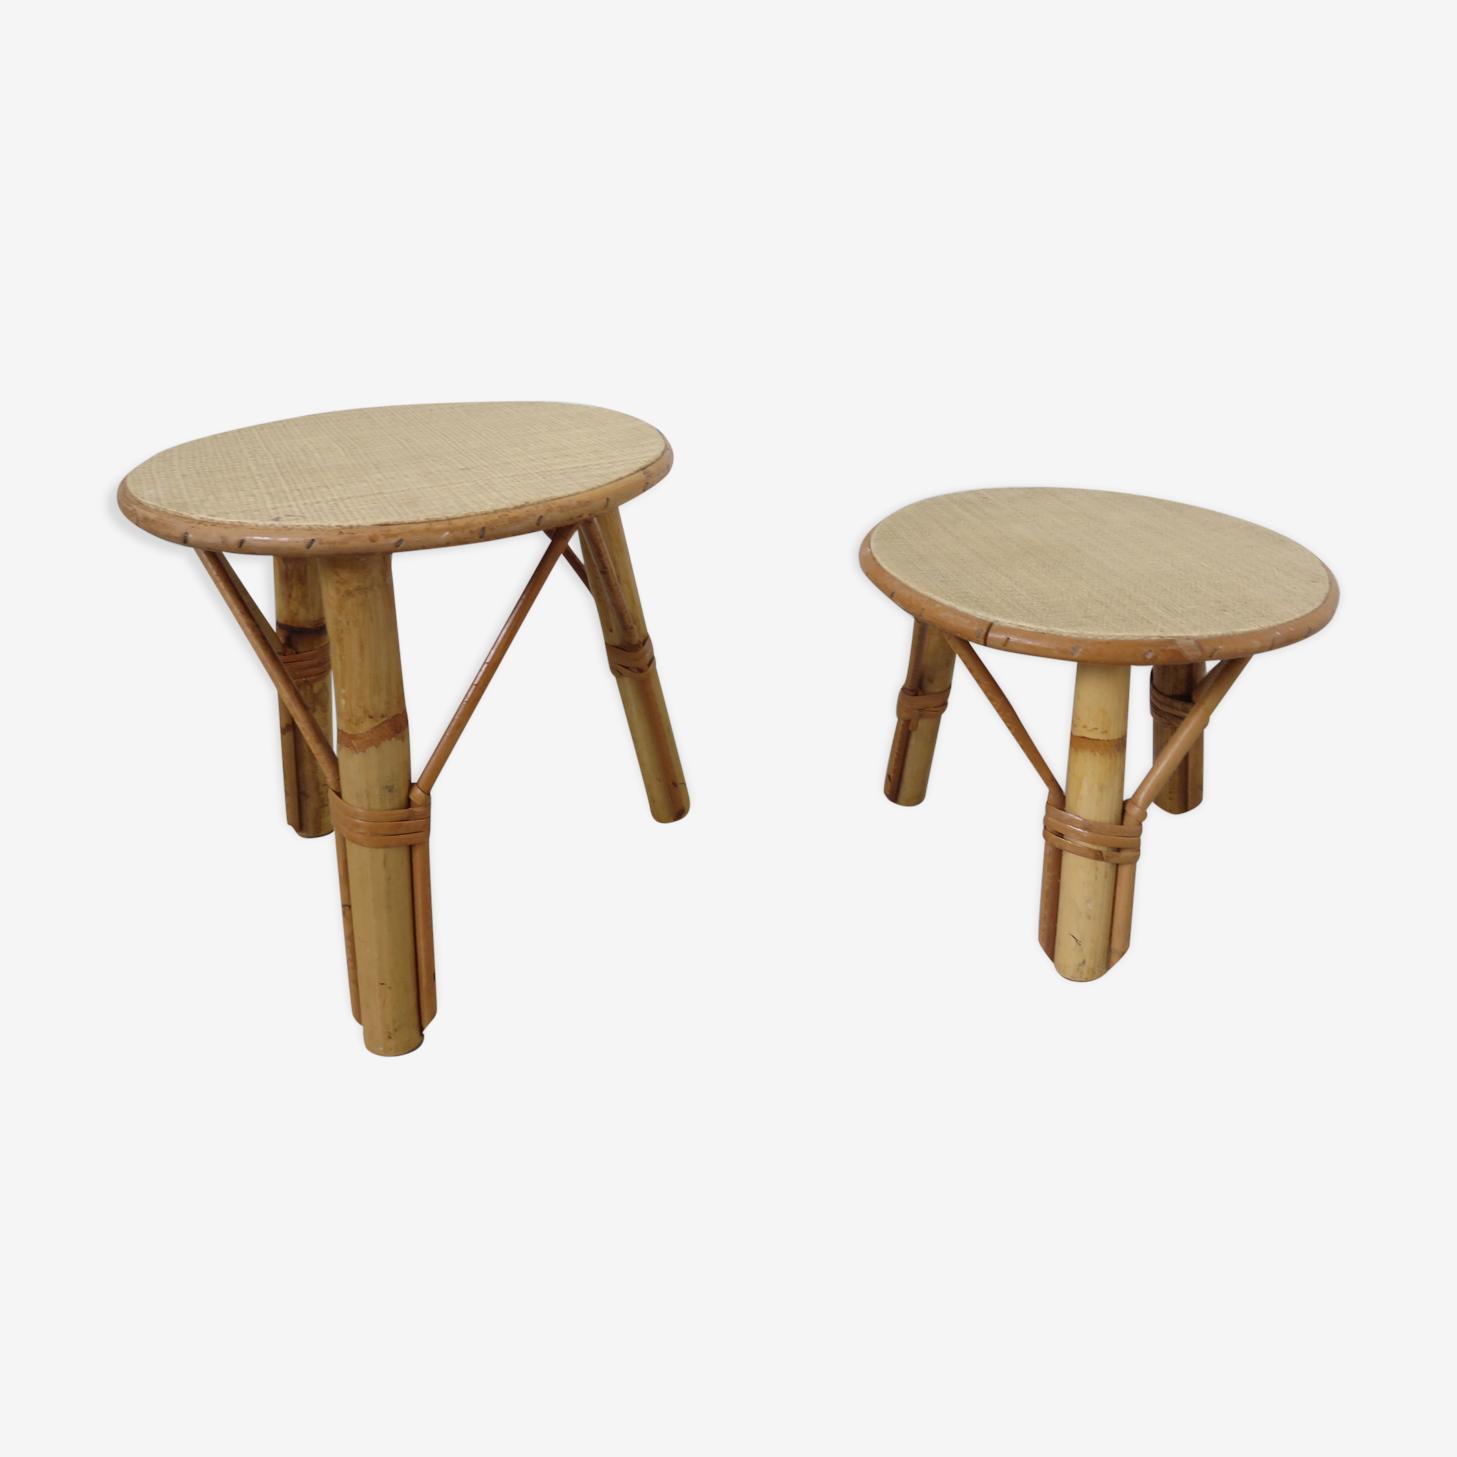 2 tripod tables in rattan years 60/70